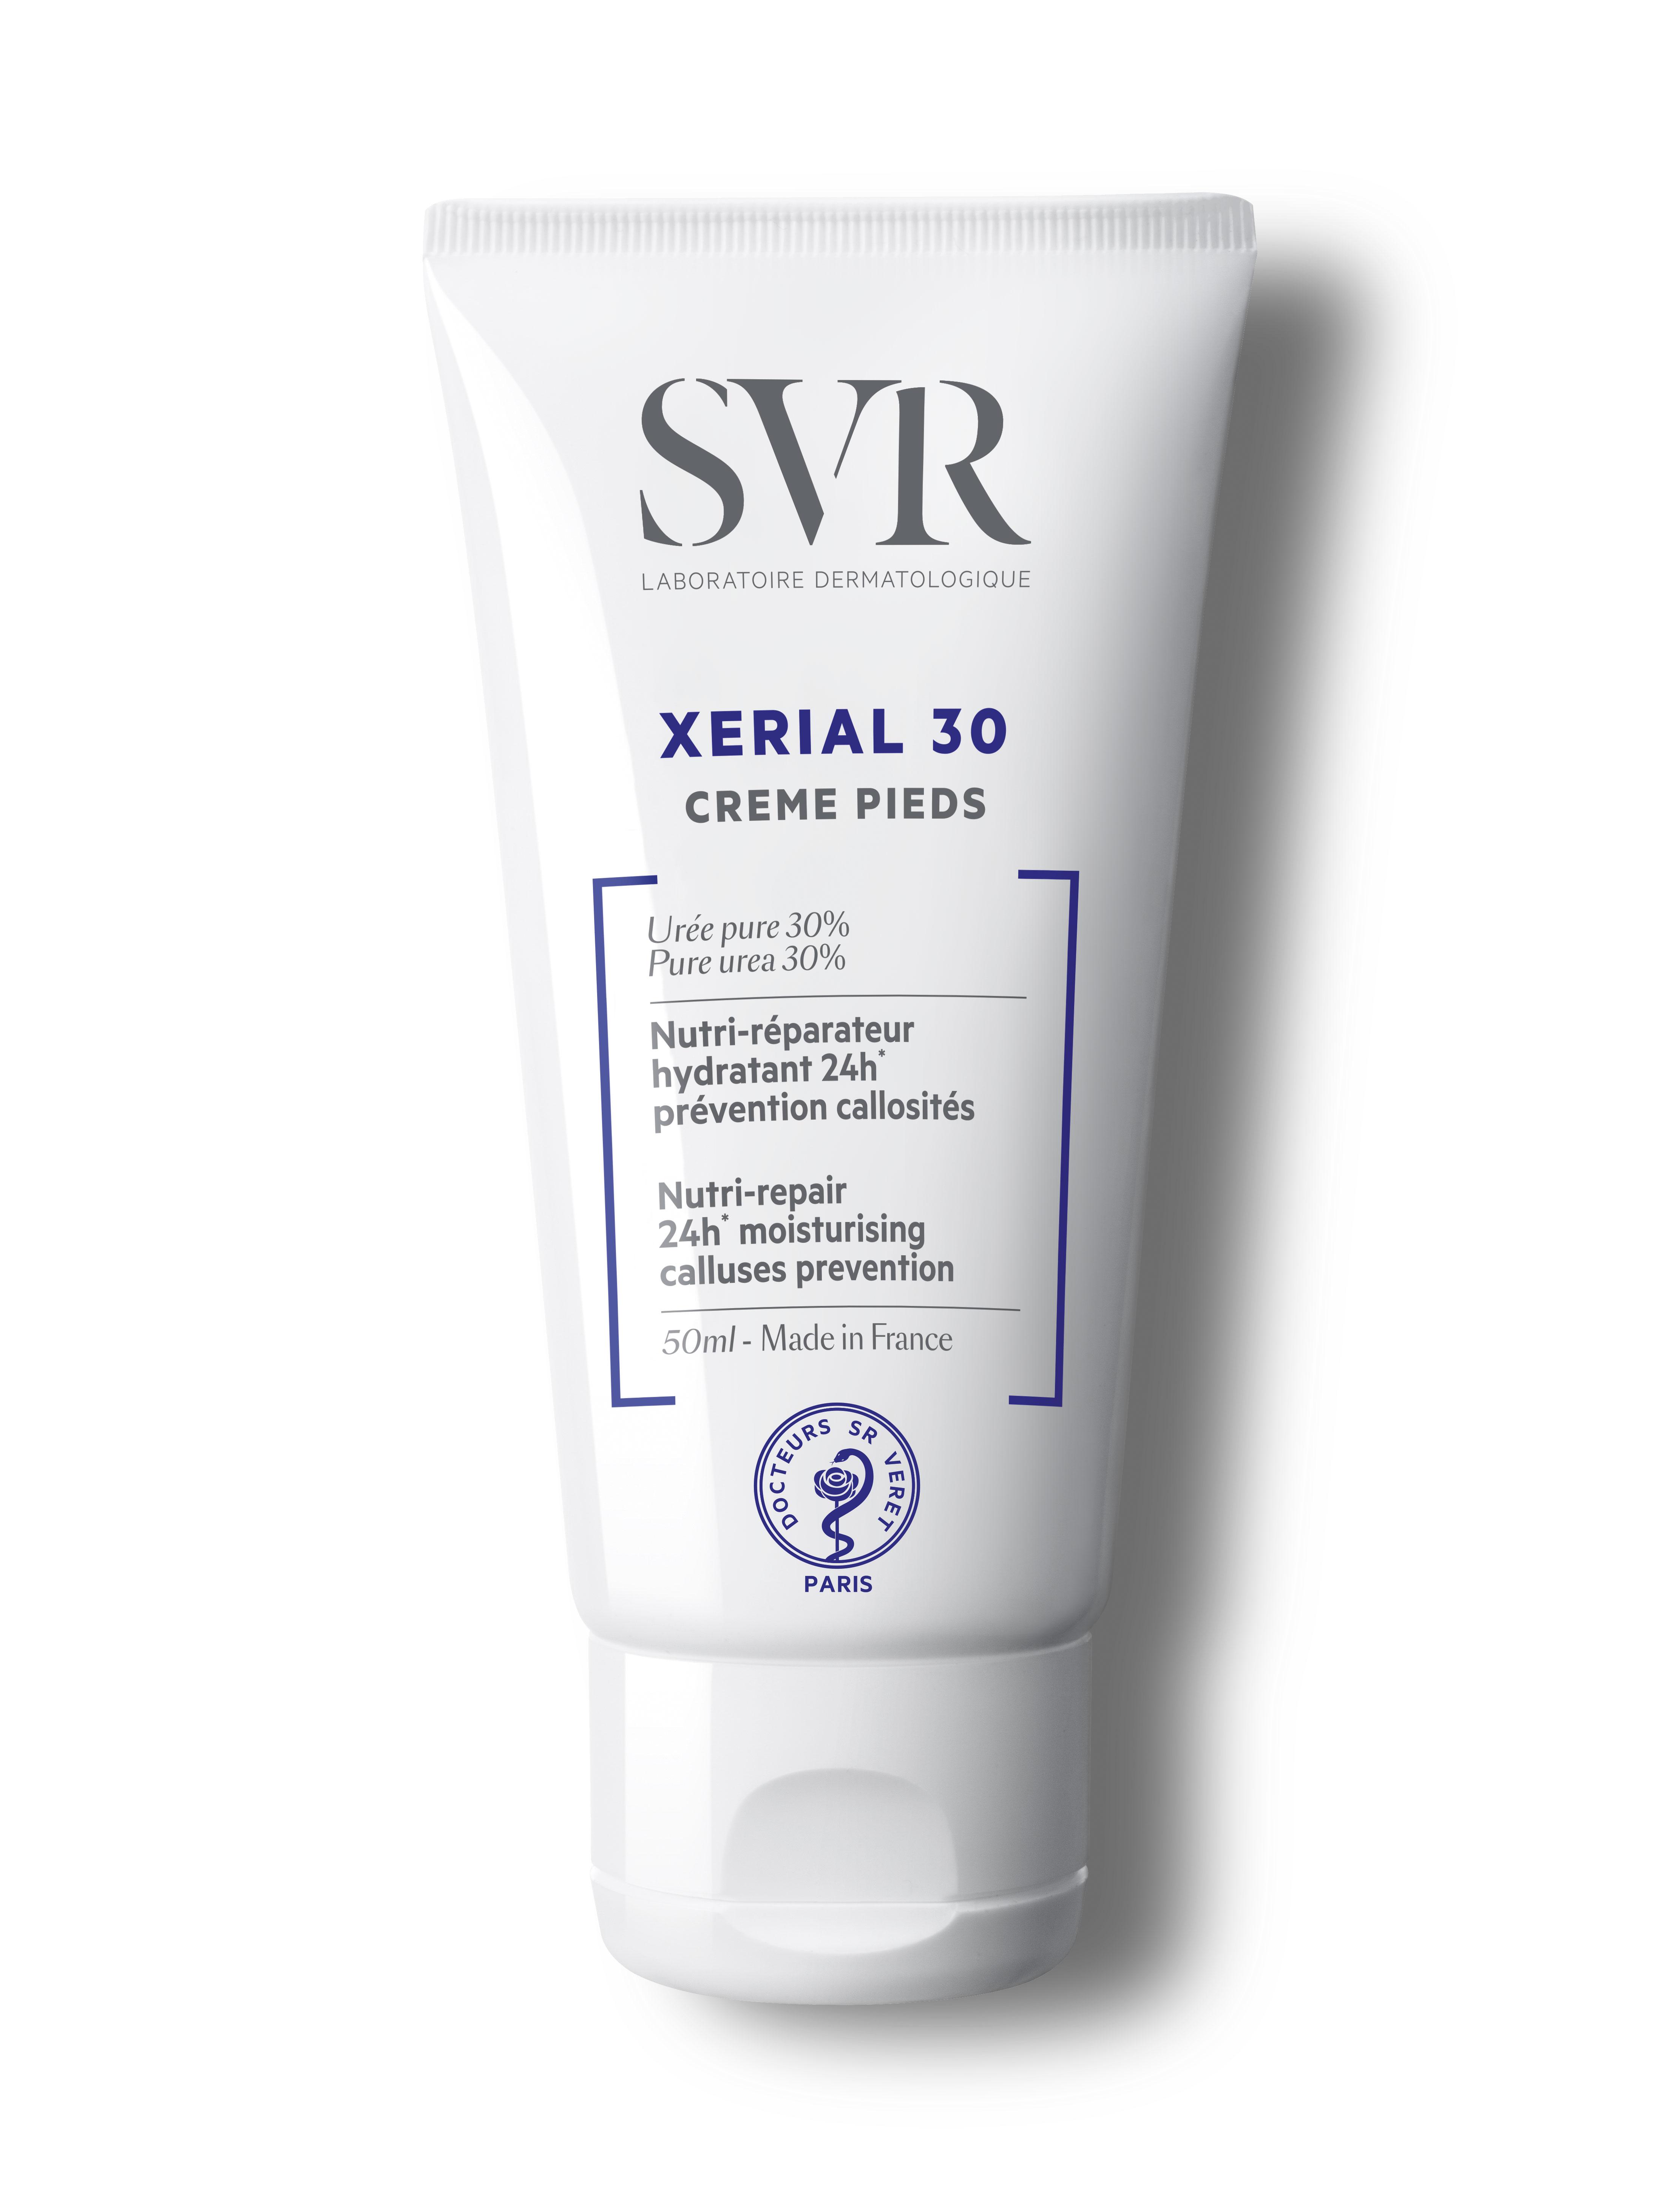 SVR Ксериал 30 Крем для ног 50 мл (SVR, Xerial) svr xerial 50 крем для ног экстрем сдвойка 2х50 мл